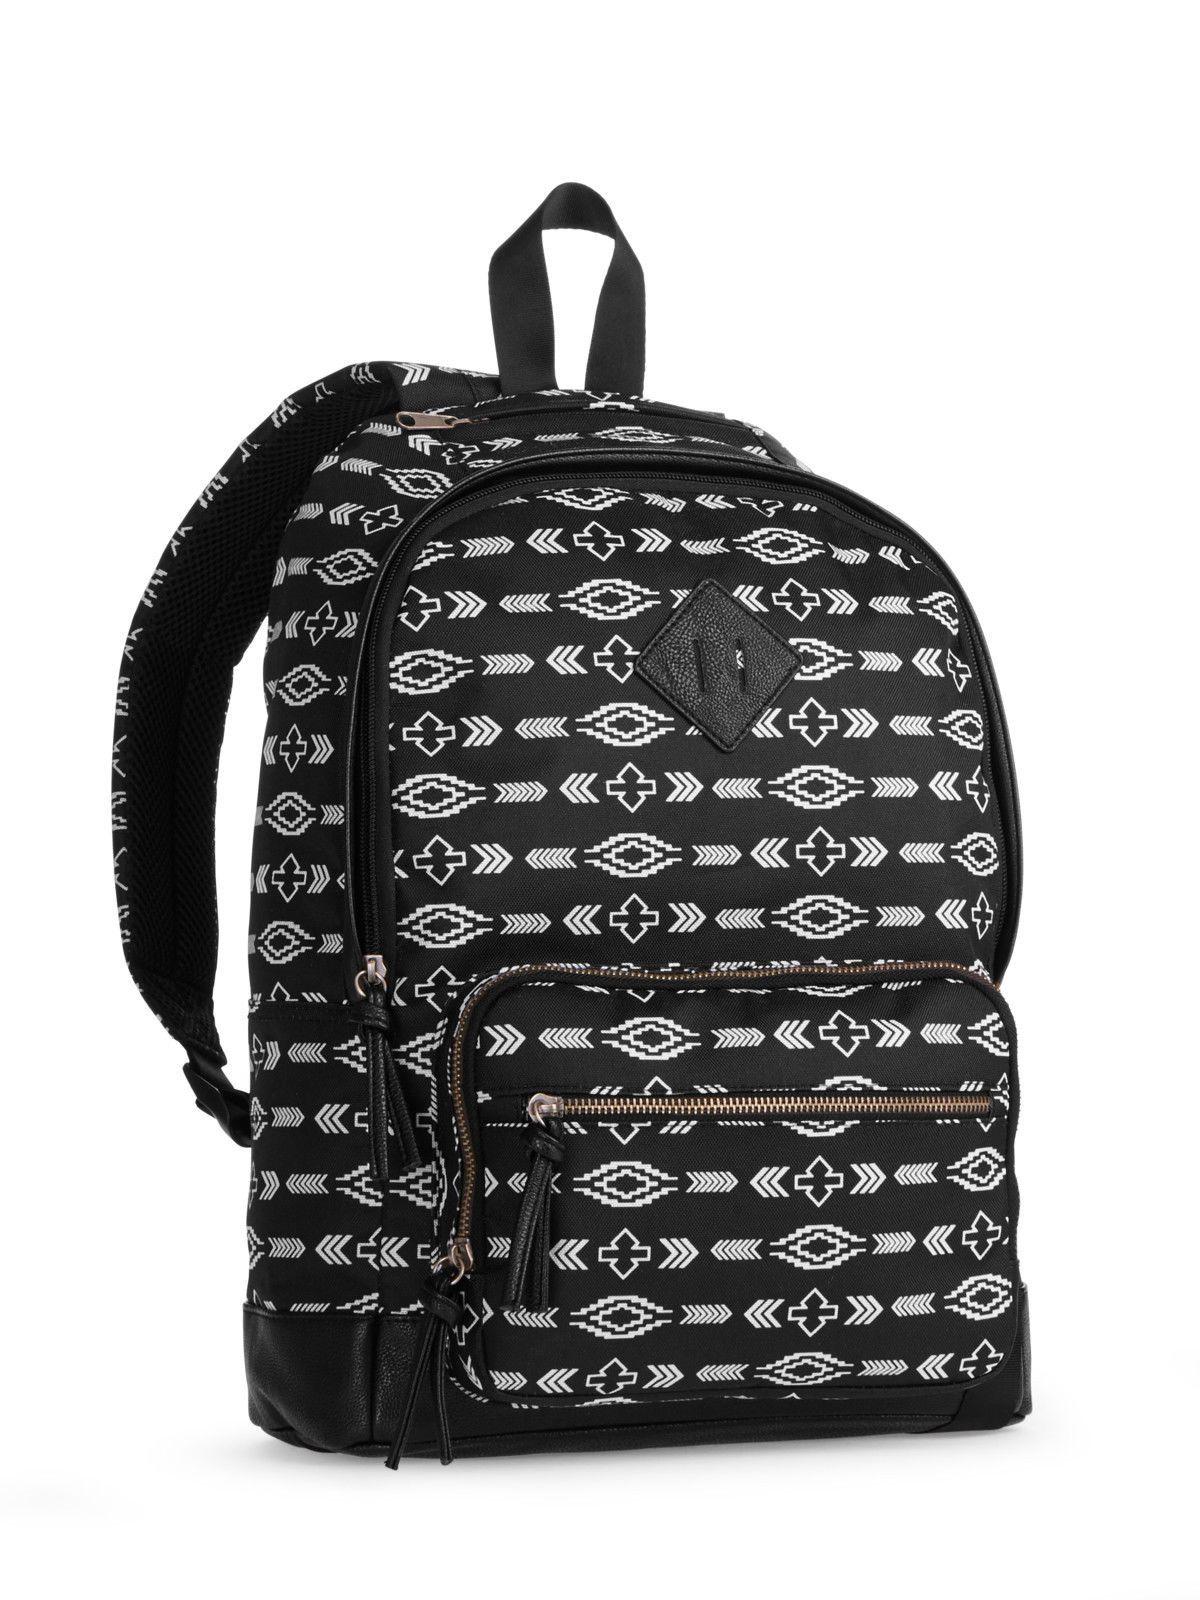 Black bag casual male backpacks school travel bag leather